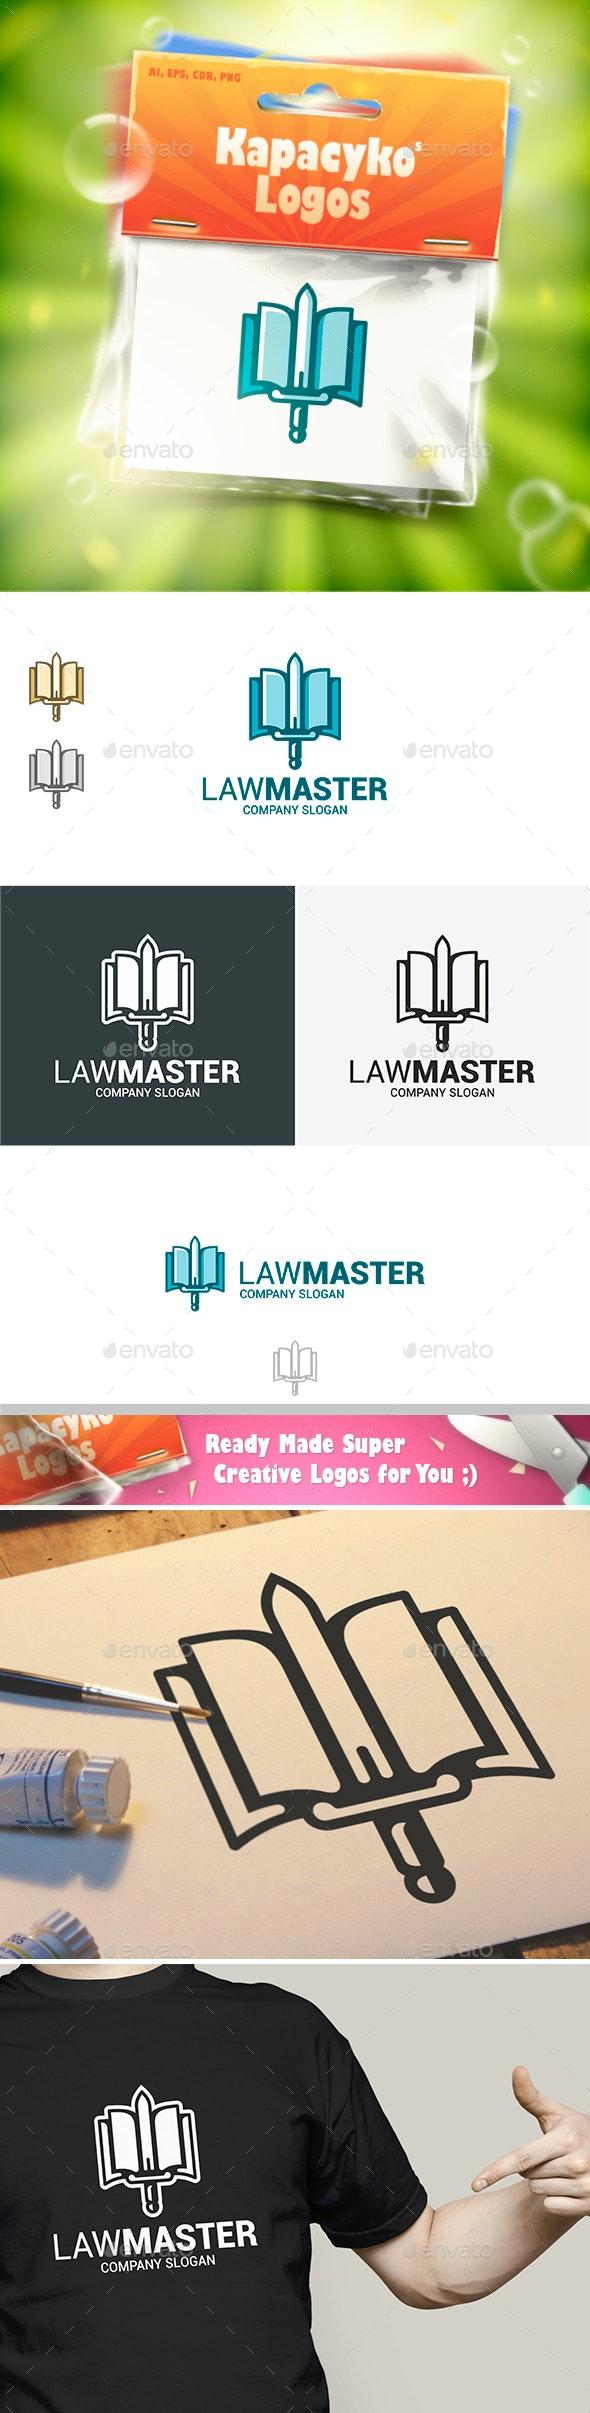 Law Master Logo - Abstract Logo Templates